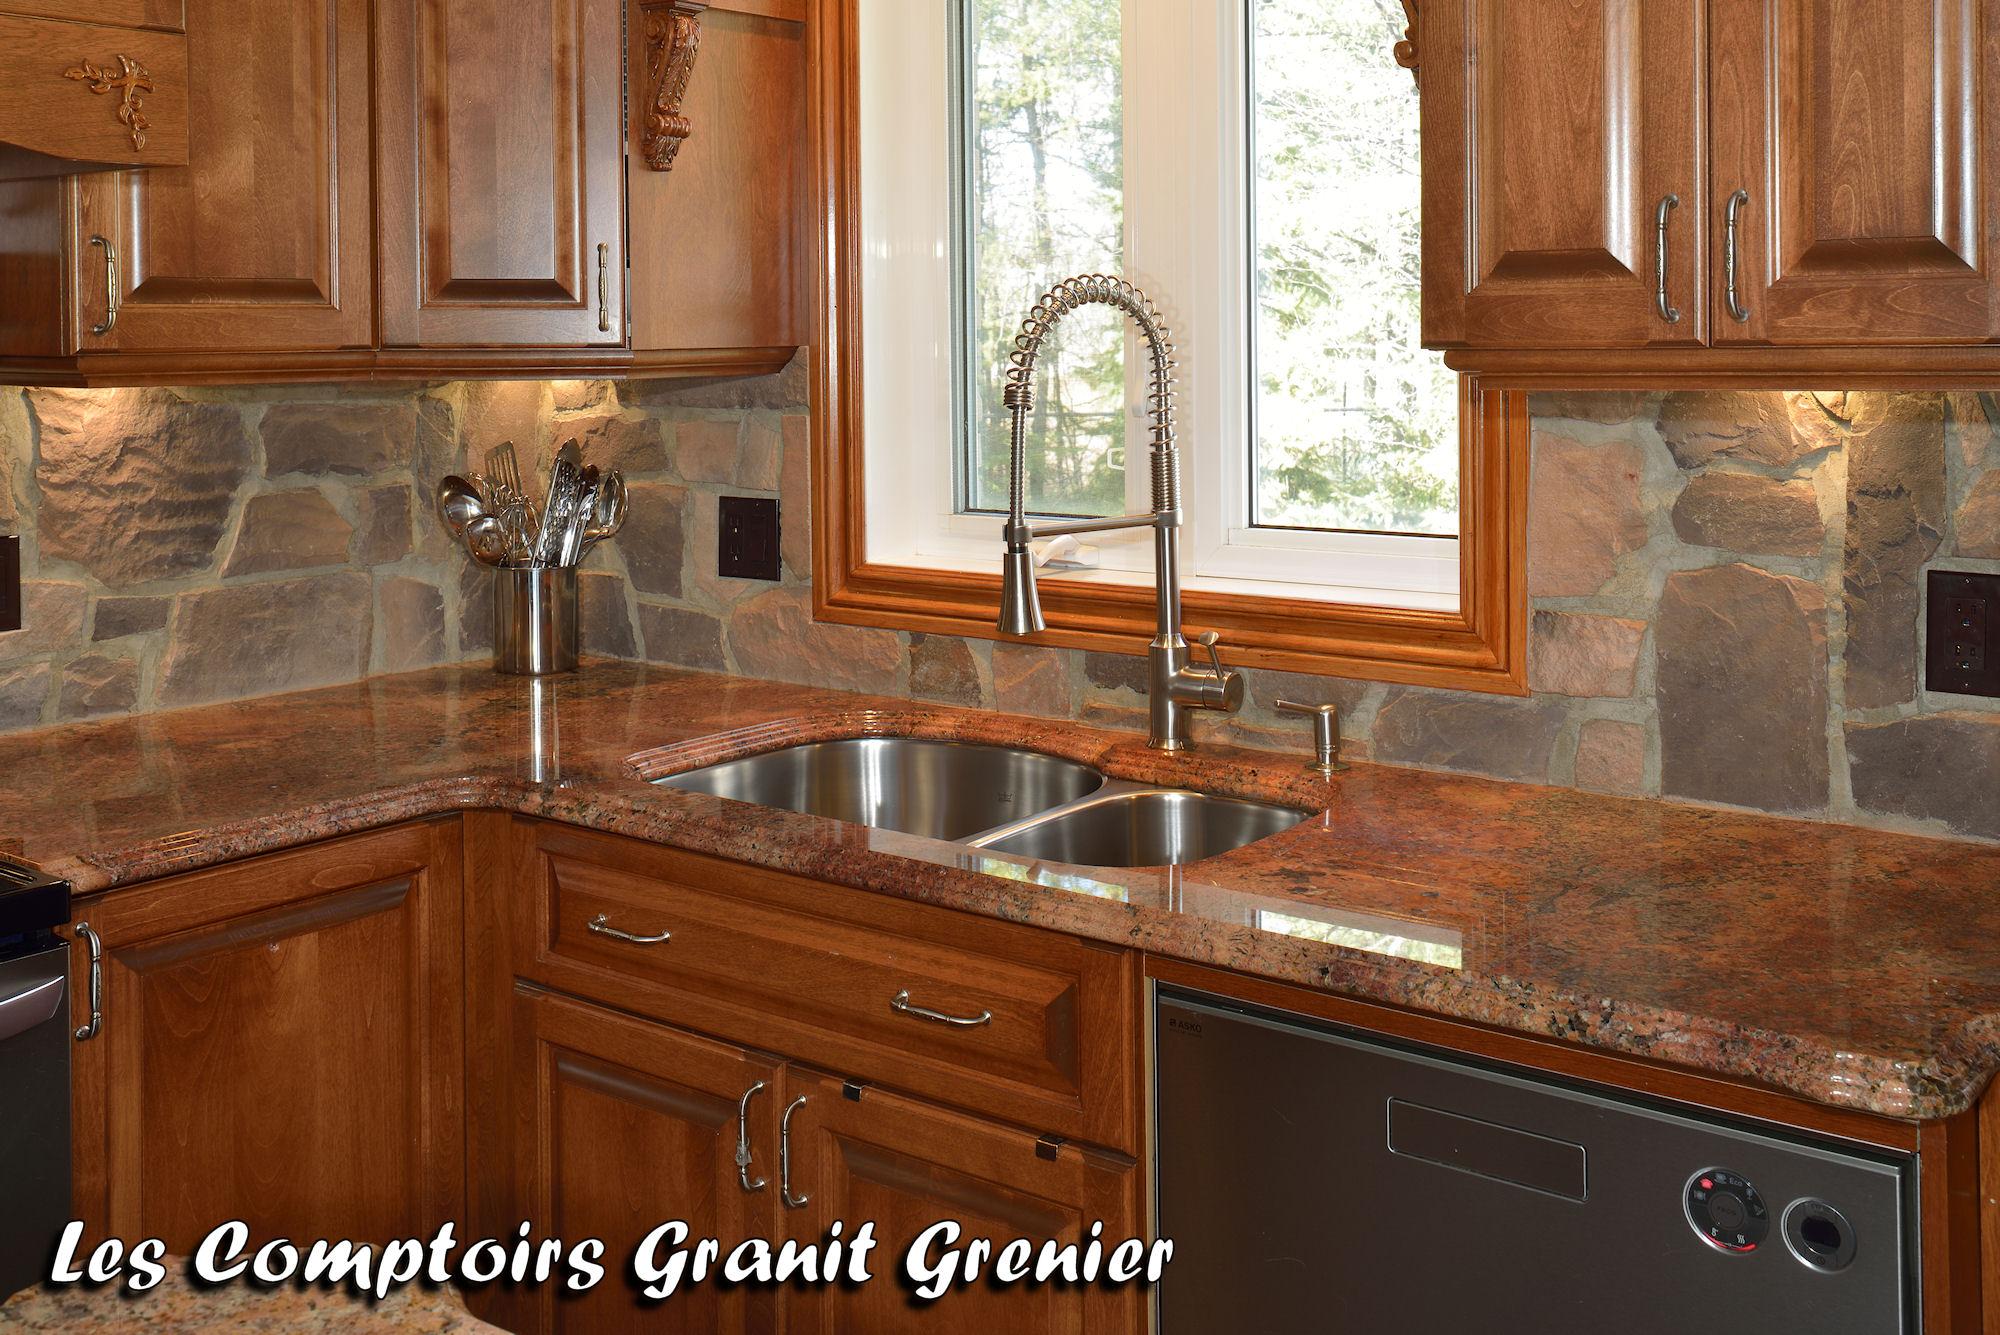 Comptoir de Granit et Quartz  Ralisations de cuisines et vanits